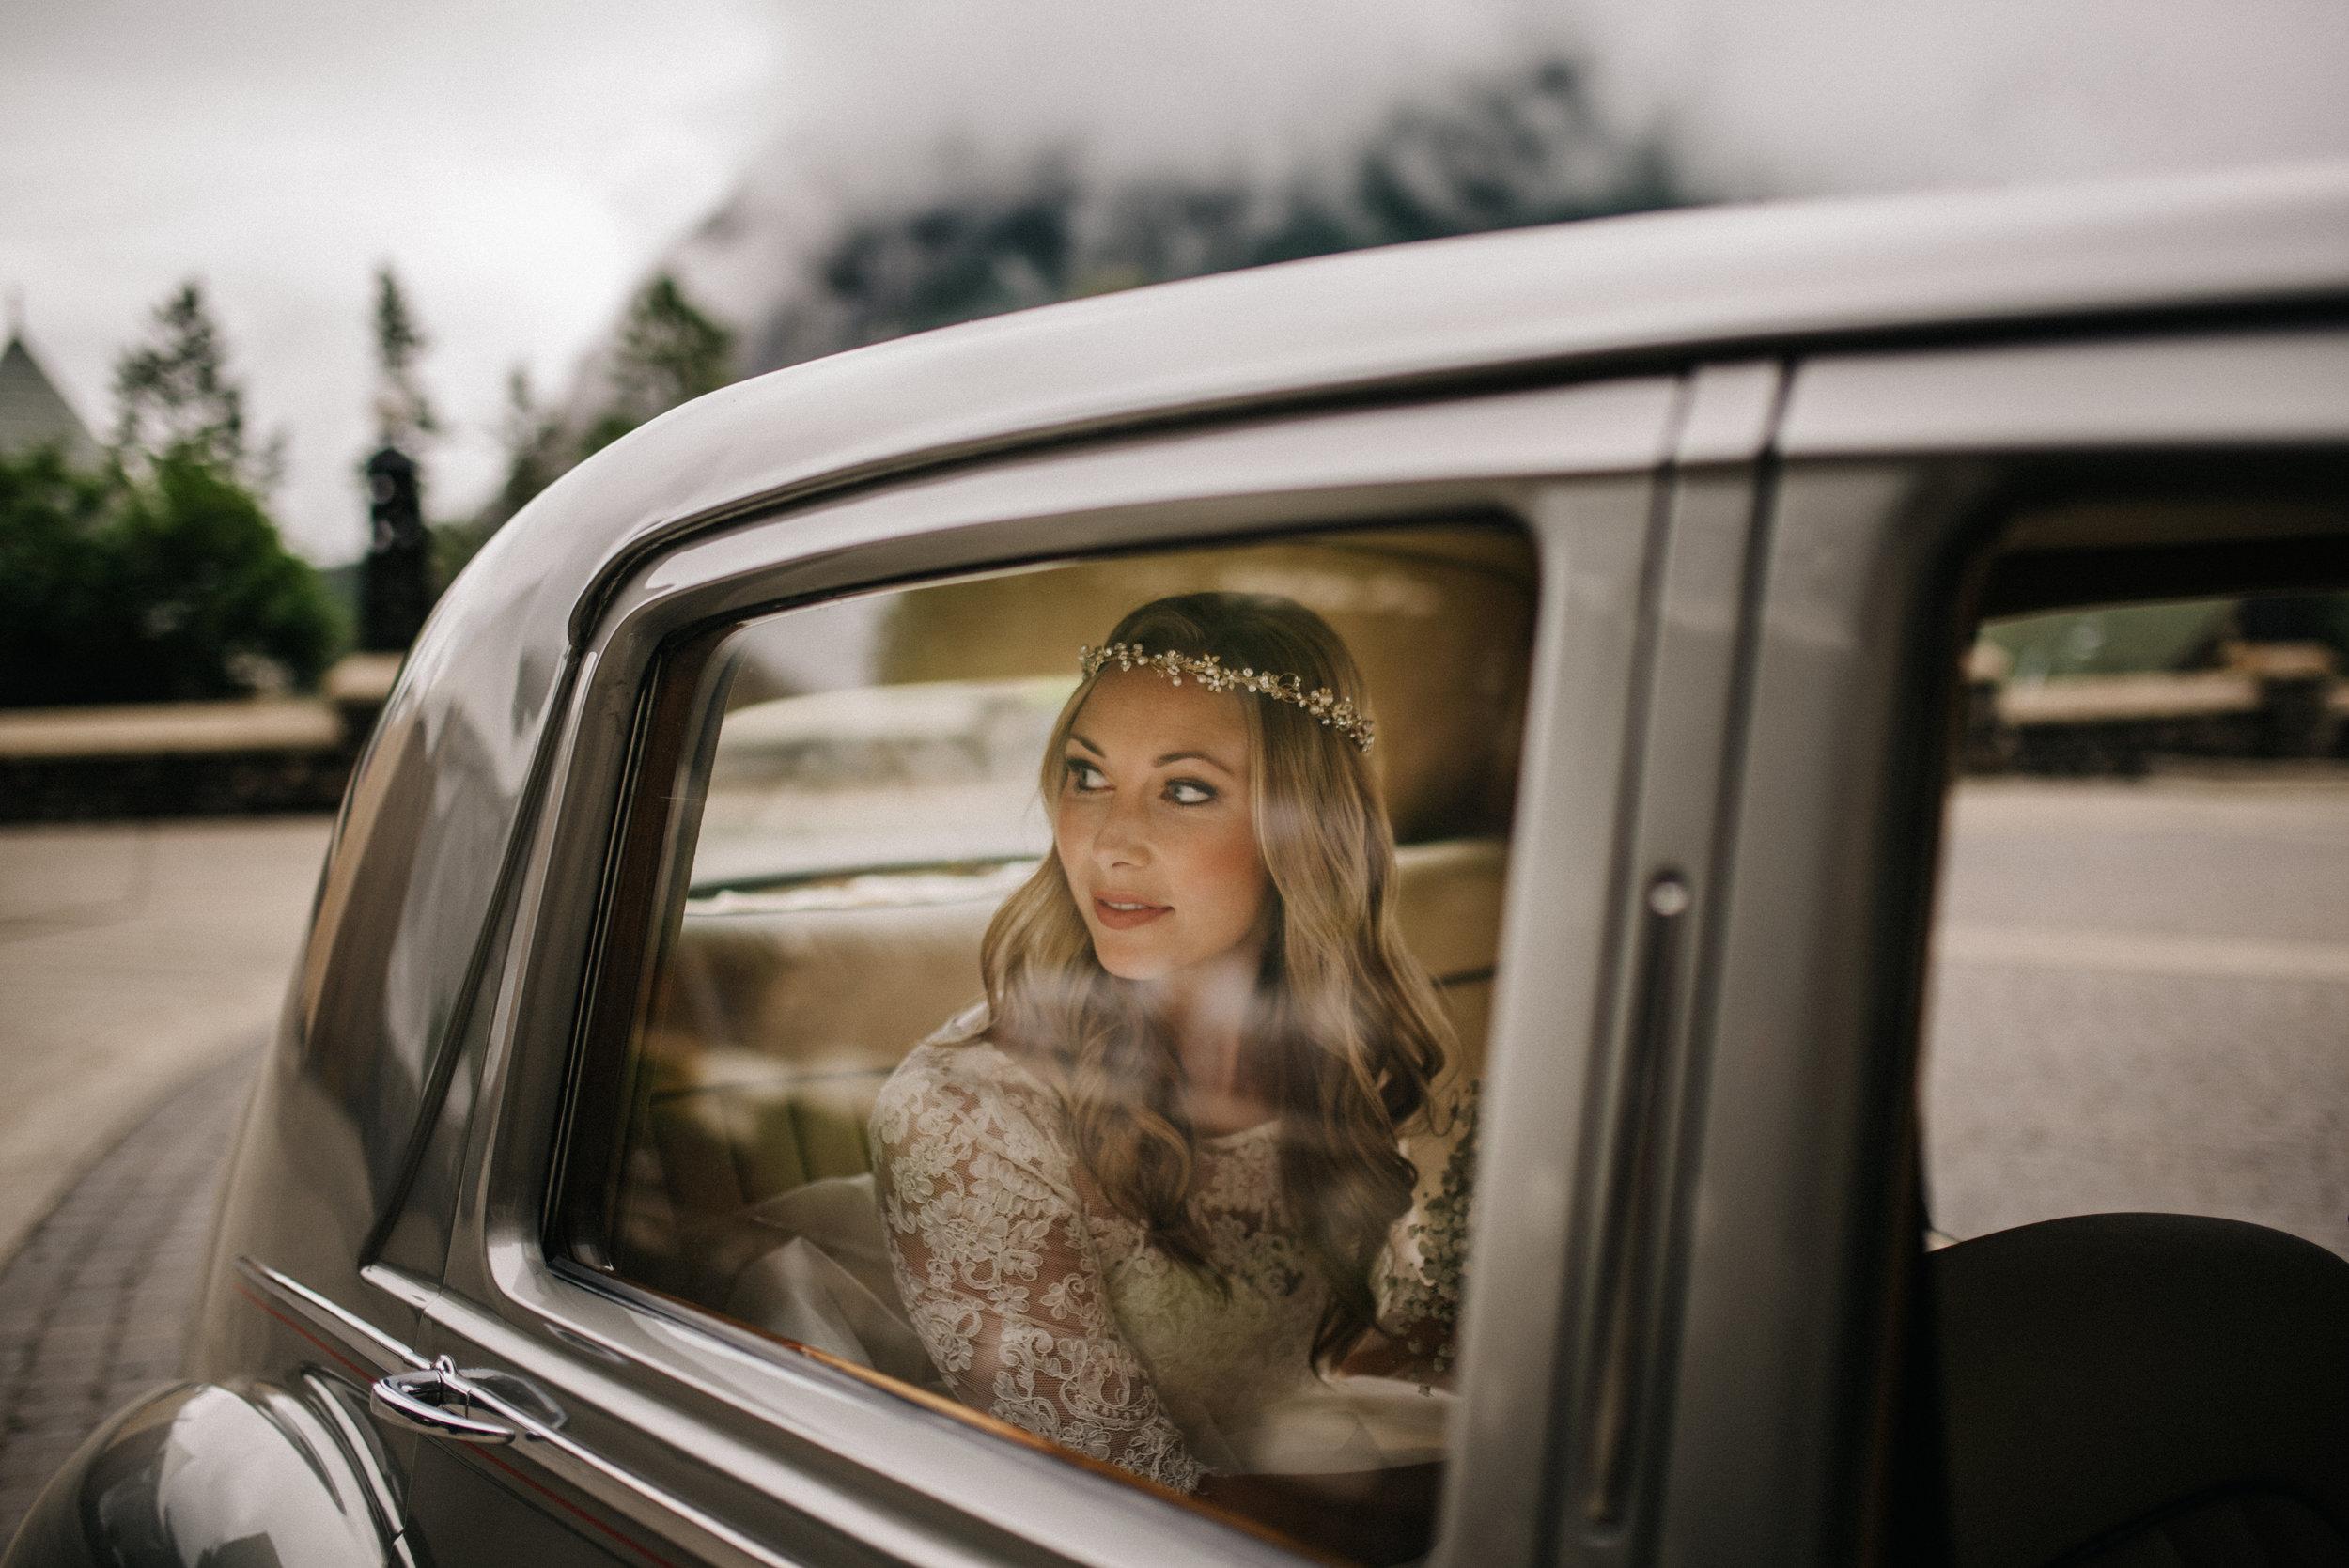 GABE MCCLINTOCK  Wedding photographer  EDITING LEVEL: BASIC+ PRESET:  DVLOP  WE EDIT: Full galleries. Portfolio handled in-house.